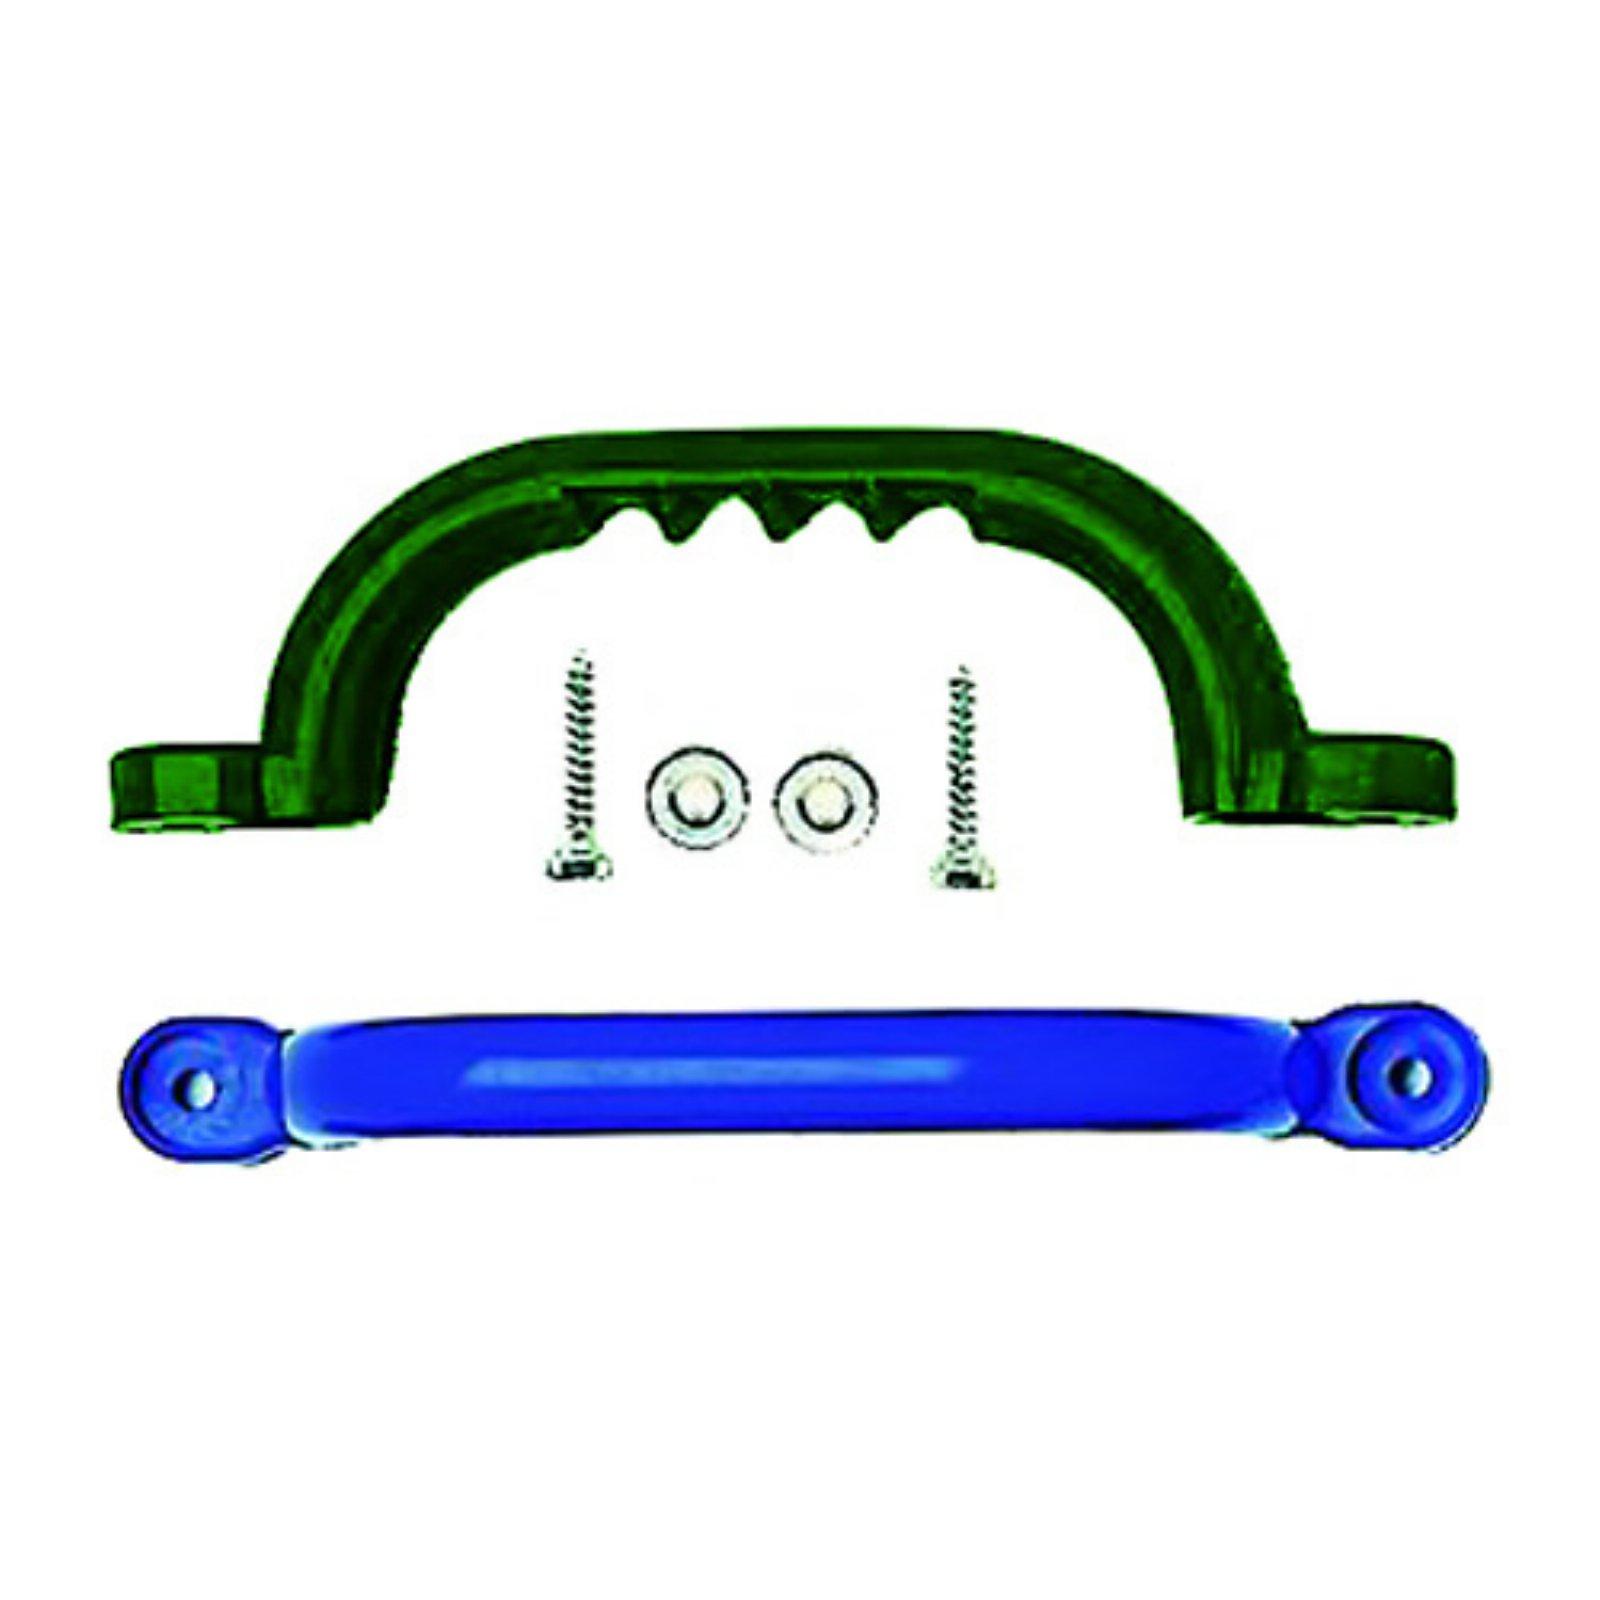 Kidwise Handgrips Playset Accessories - Set of 2